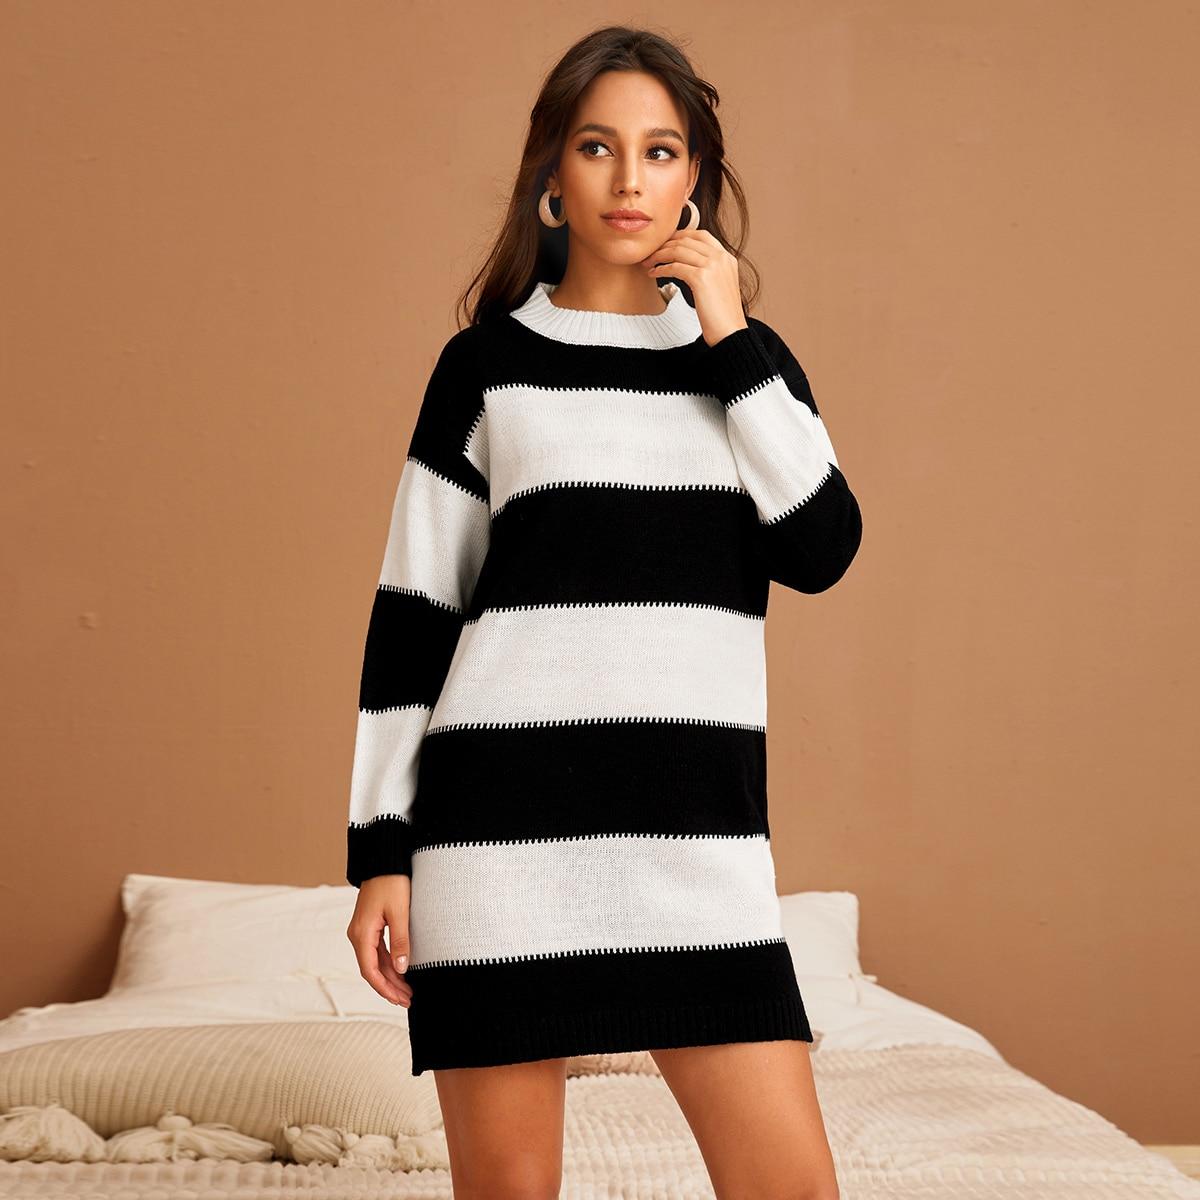 shein Casual Kleurblok Gebreide jurk